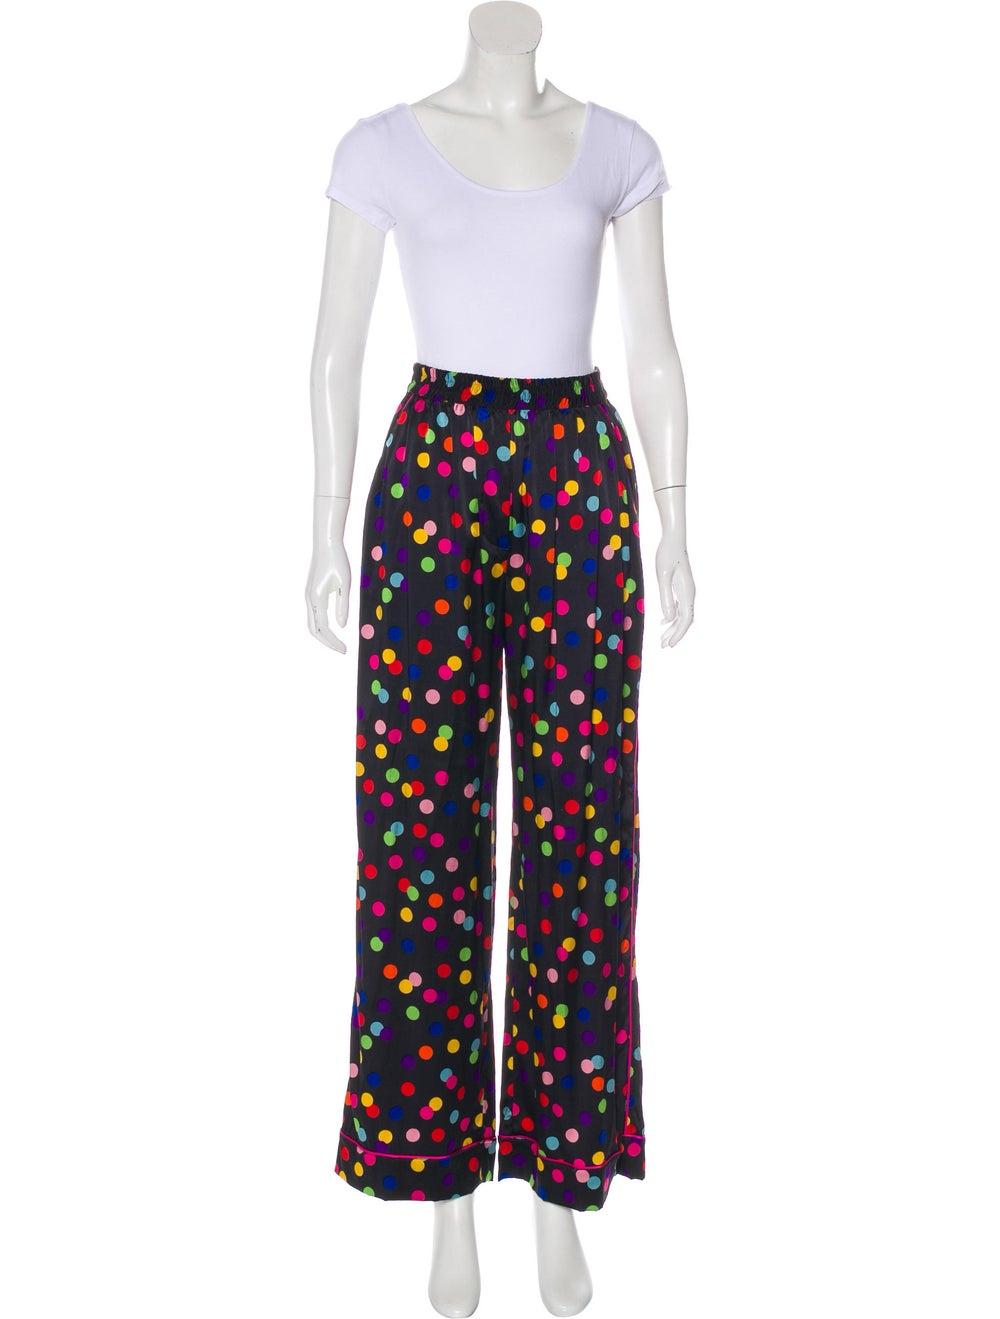 Dolce & Gabbana Polka Dot Silk Pajama Set Black - image 4